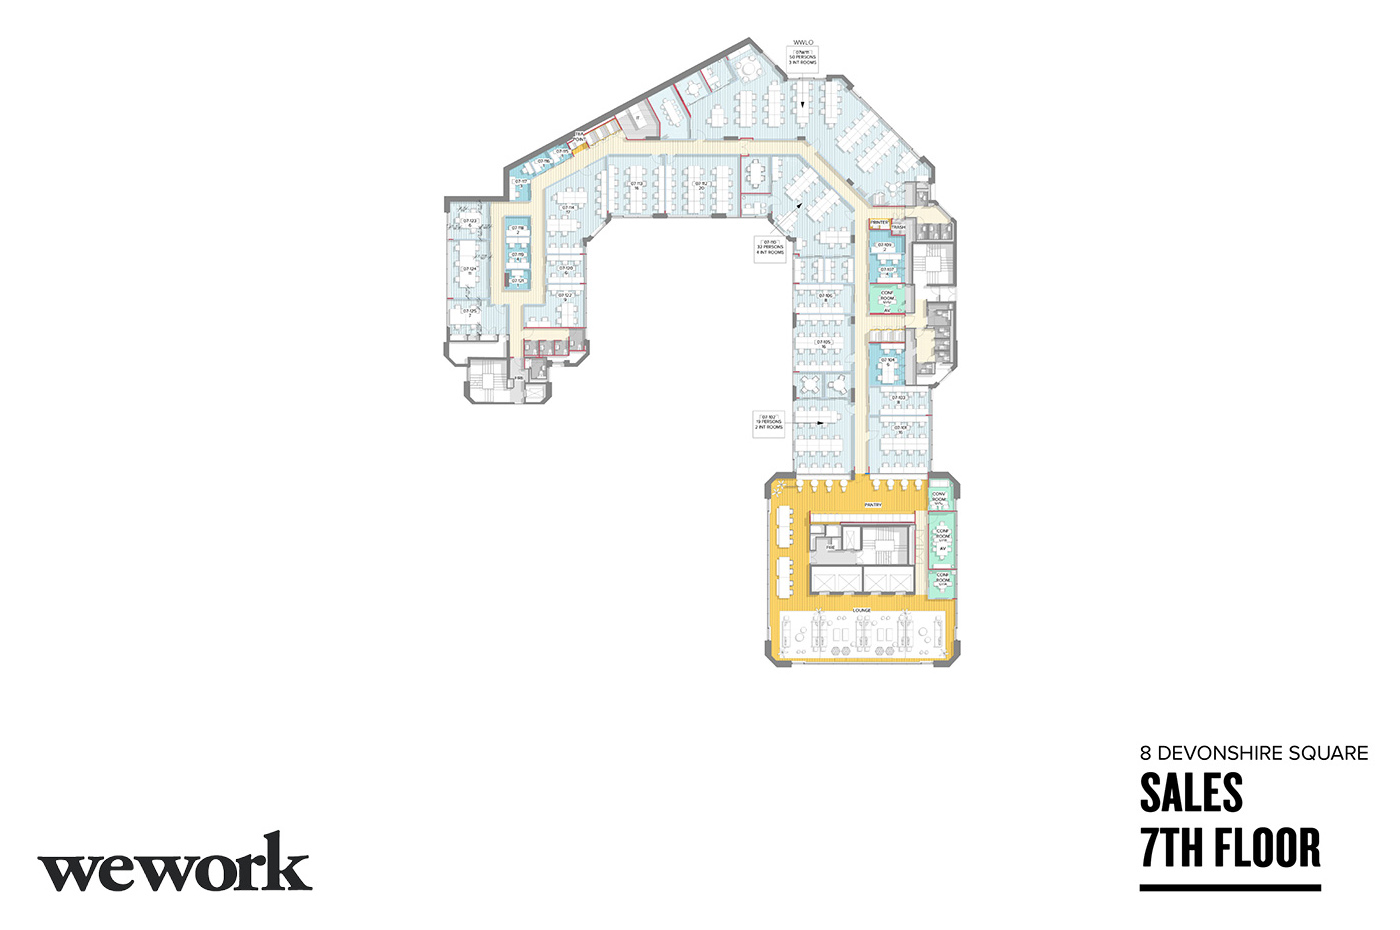 floorplans-8 copy.jpg